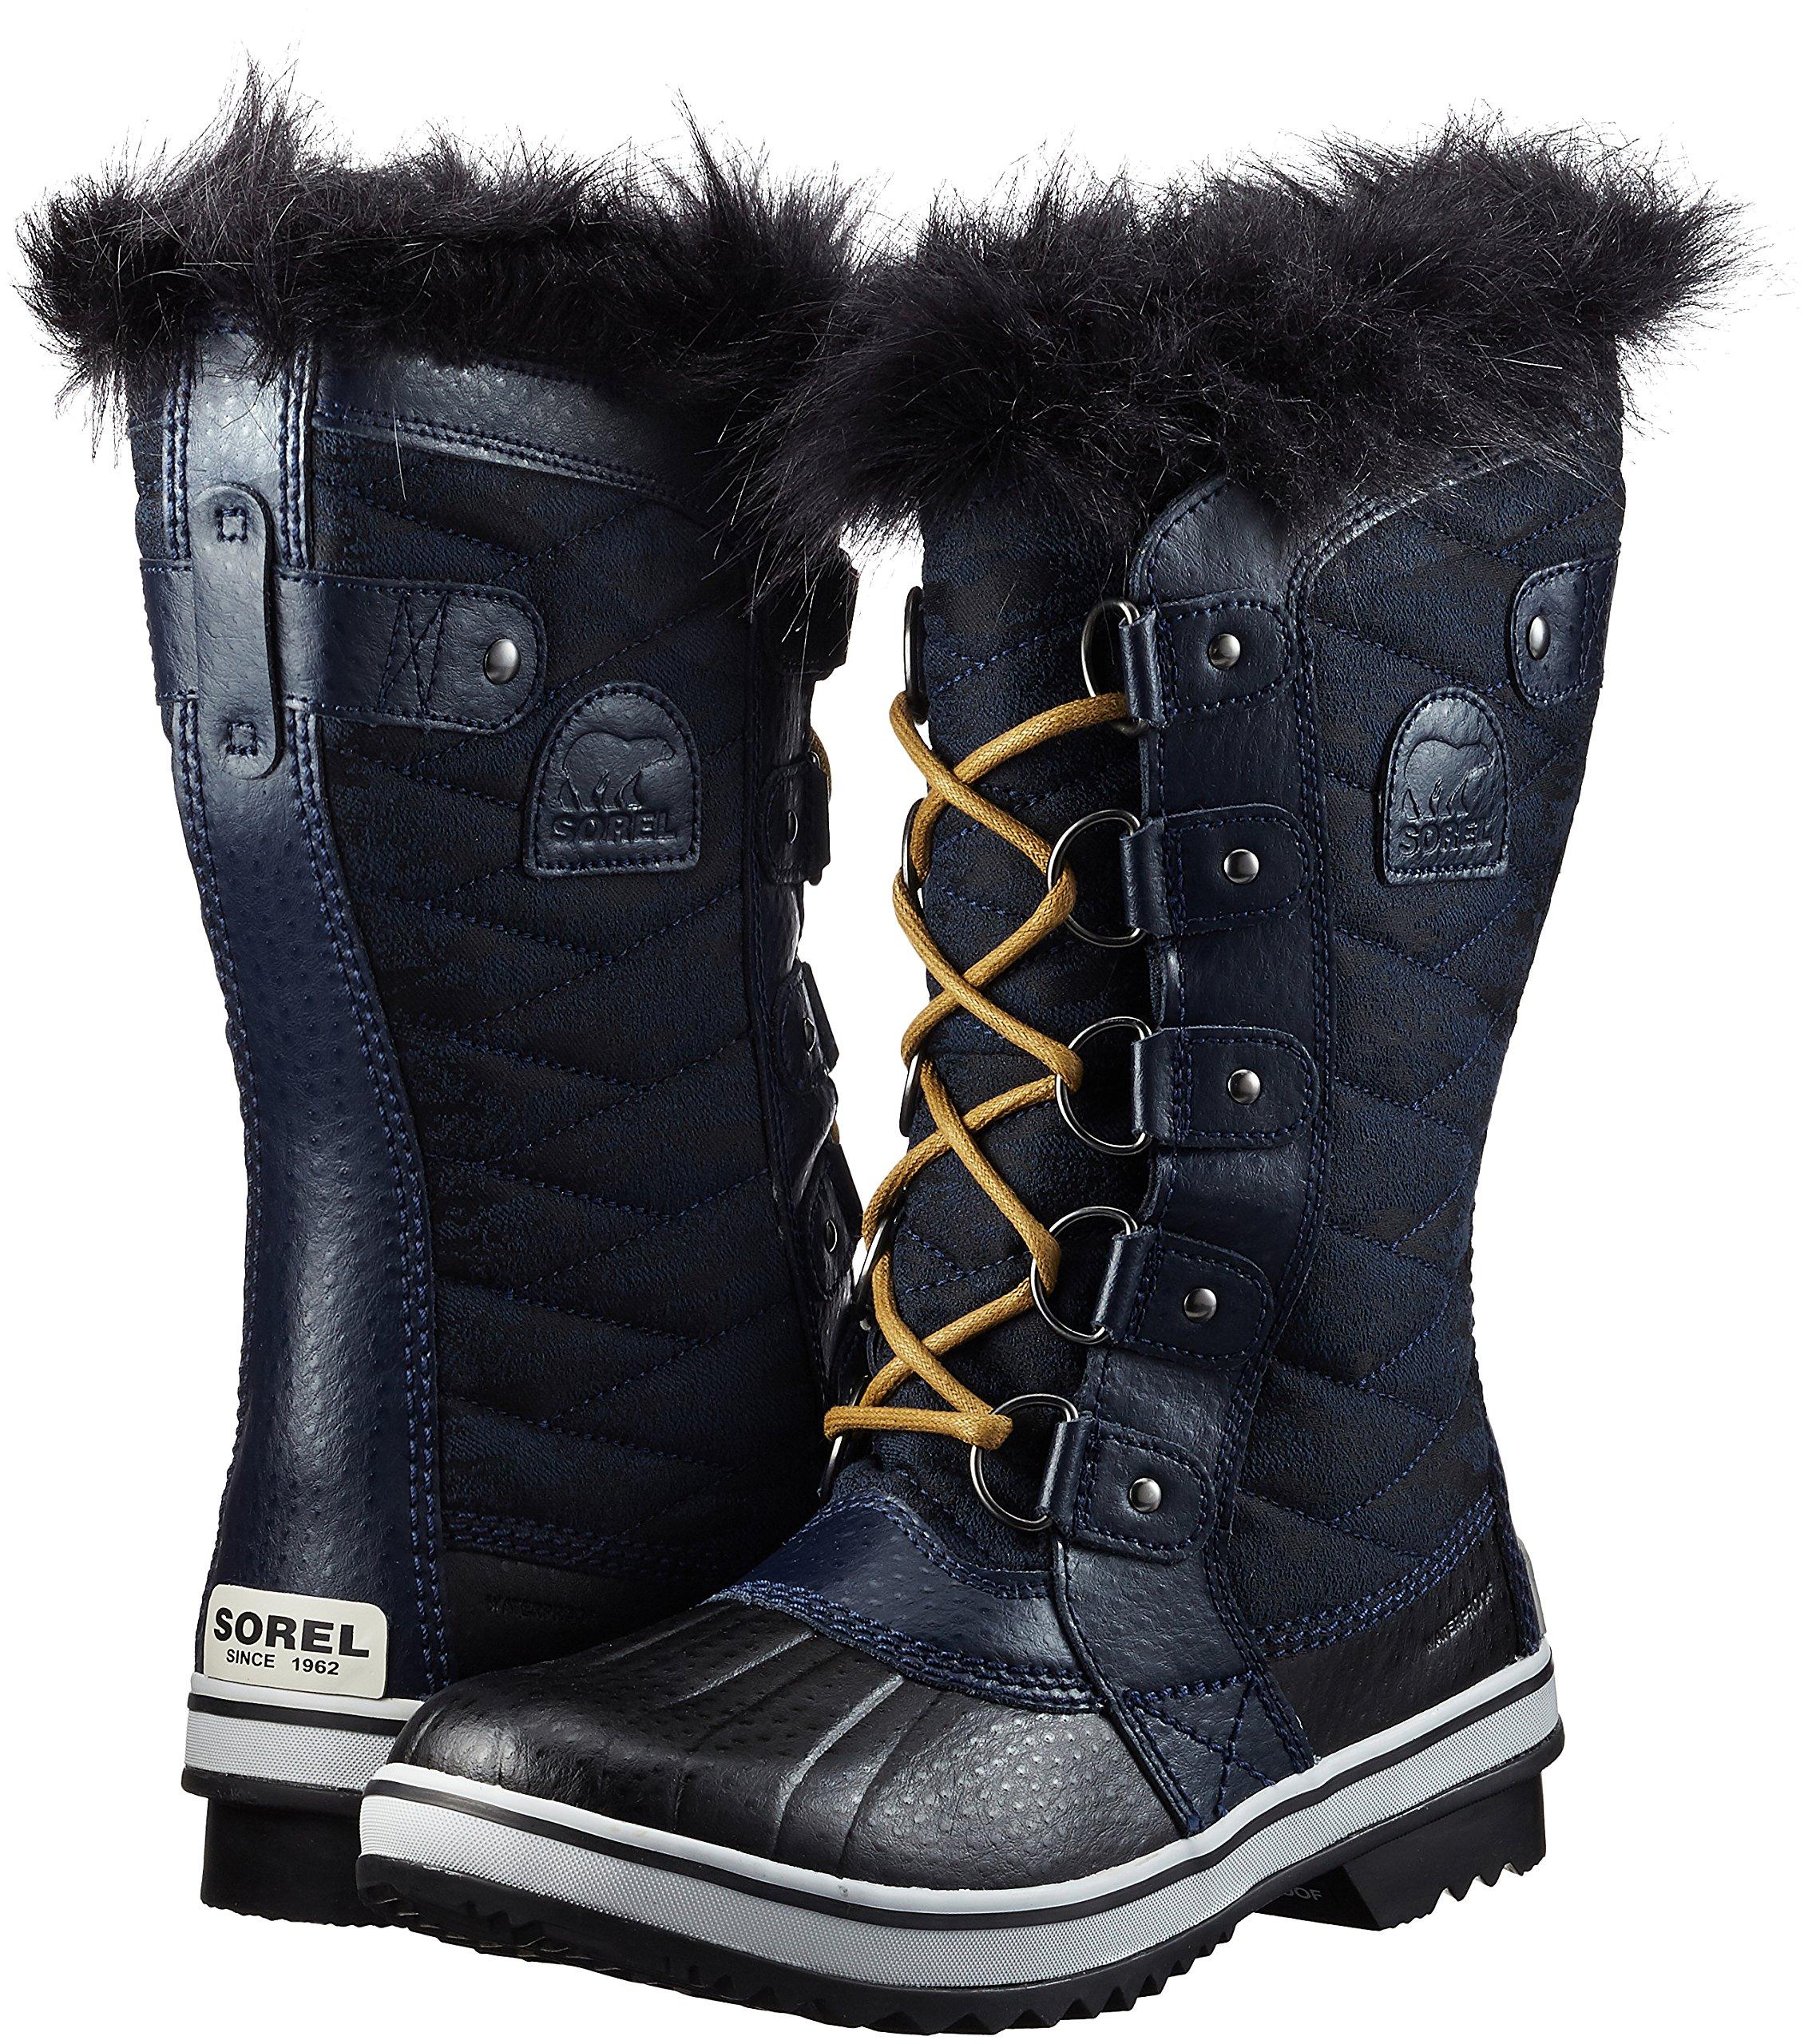 SOREL Women's 10.25 in. Tofino II Waterproof Boots, Collegiate Navy/Glare Blue 9 by SOREL (Image #5)